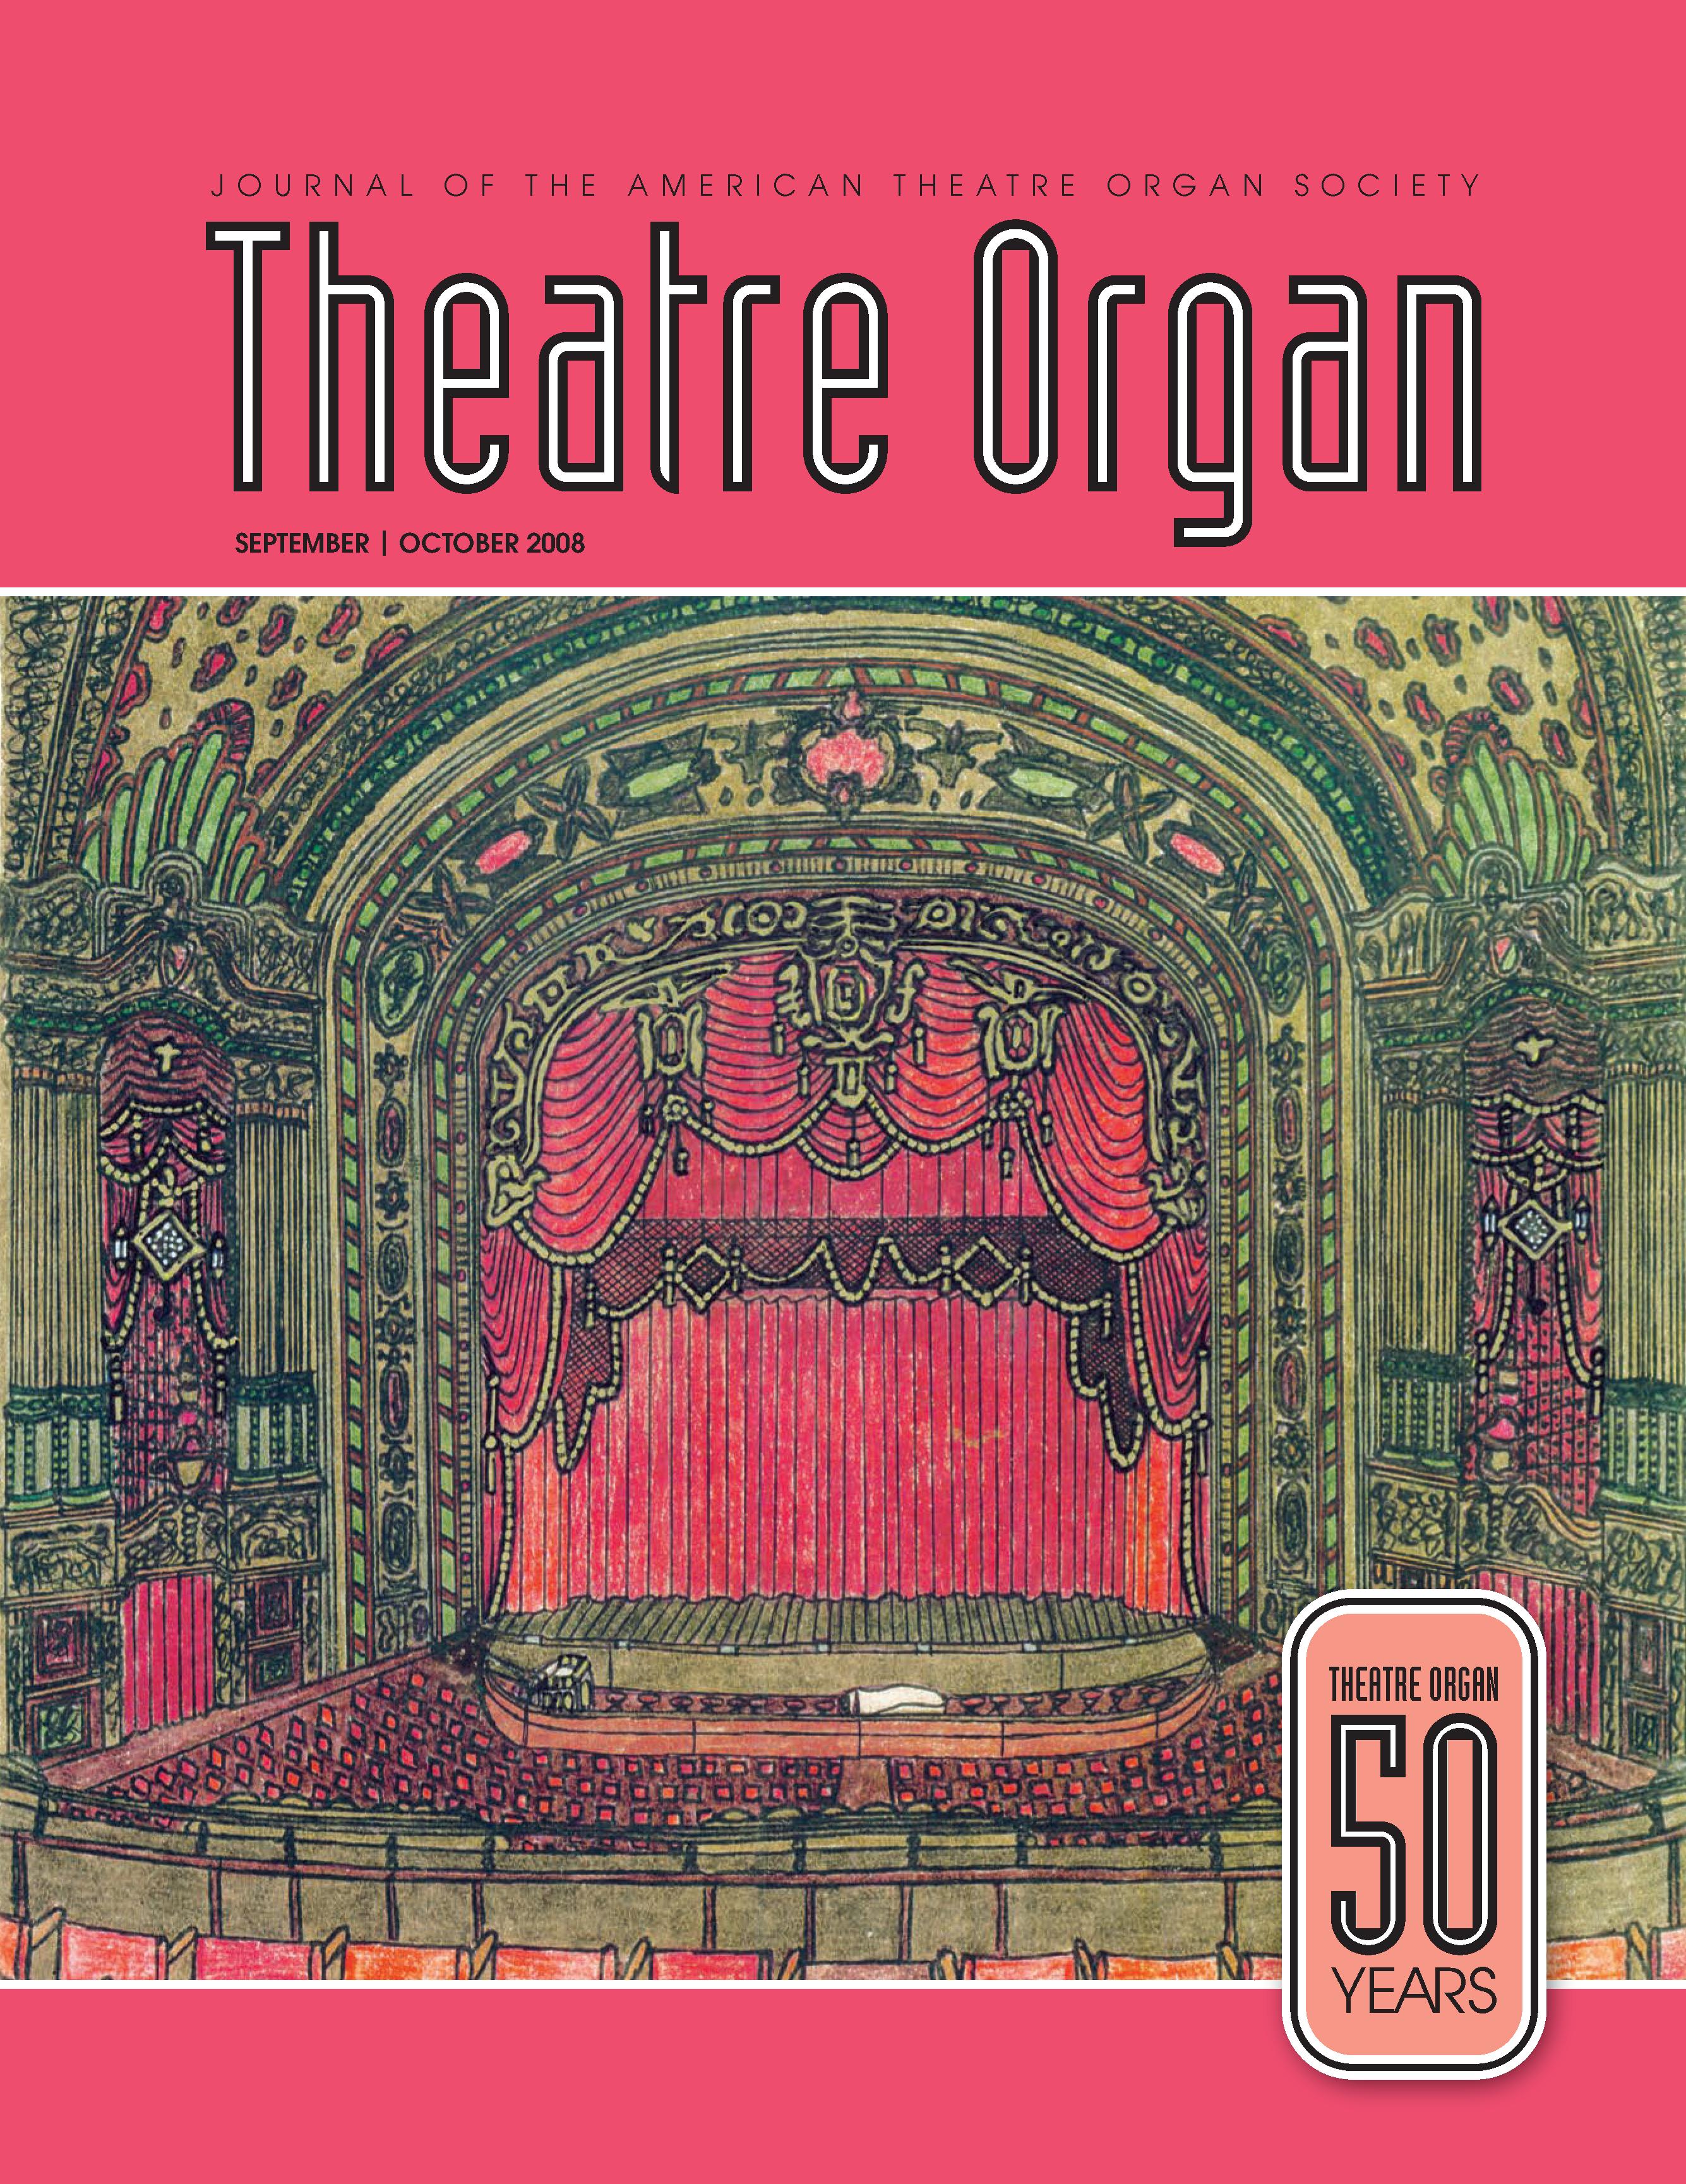 Theatre Organ, September - October 2008, Volume 50, Number 5